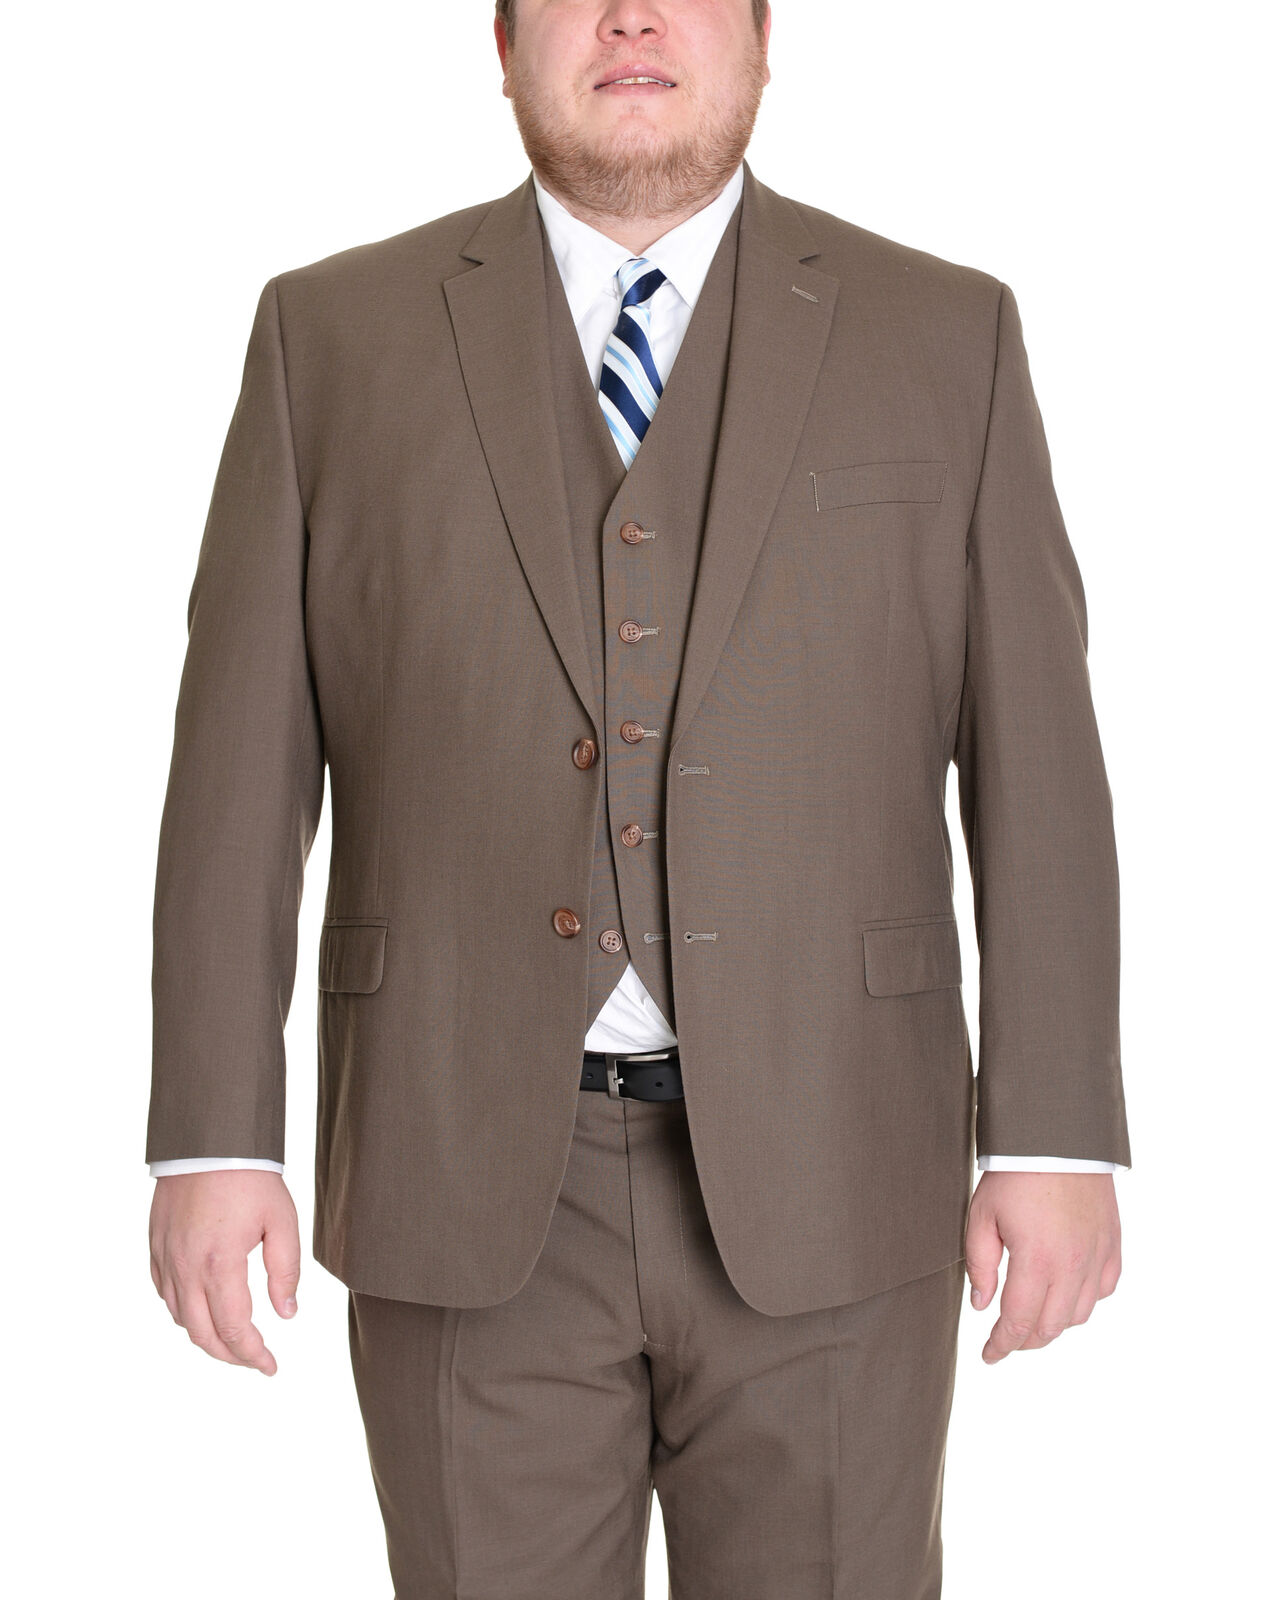 Mens 38R Ralph Ralph Ralph Lauren Mens Solid Olive Grün Two Button Three Piece Wool Suit a53